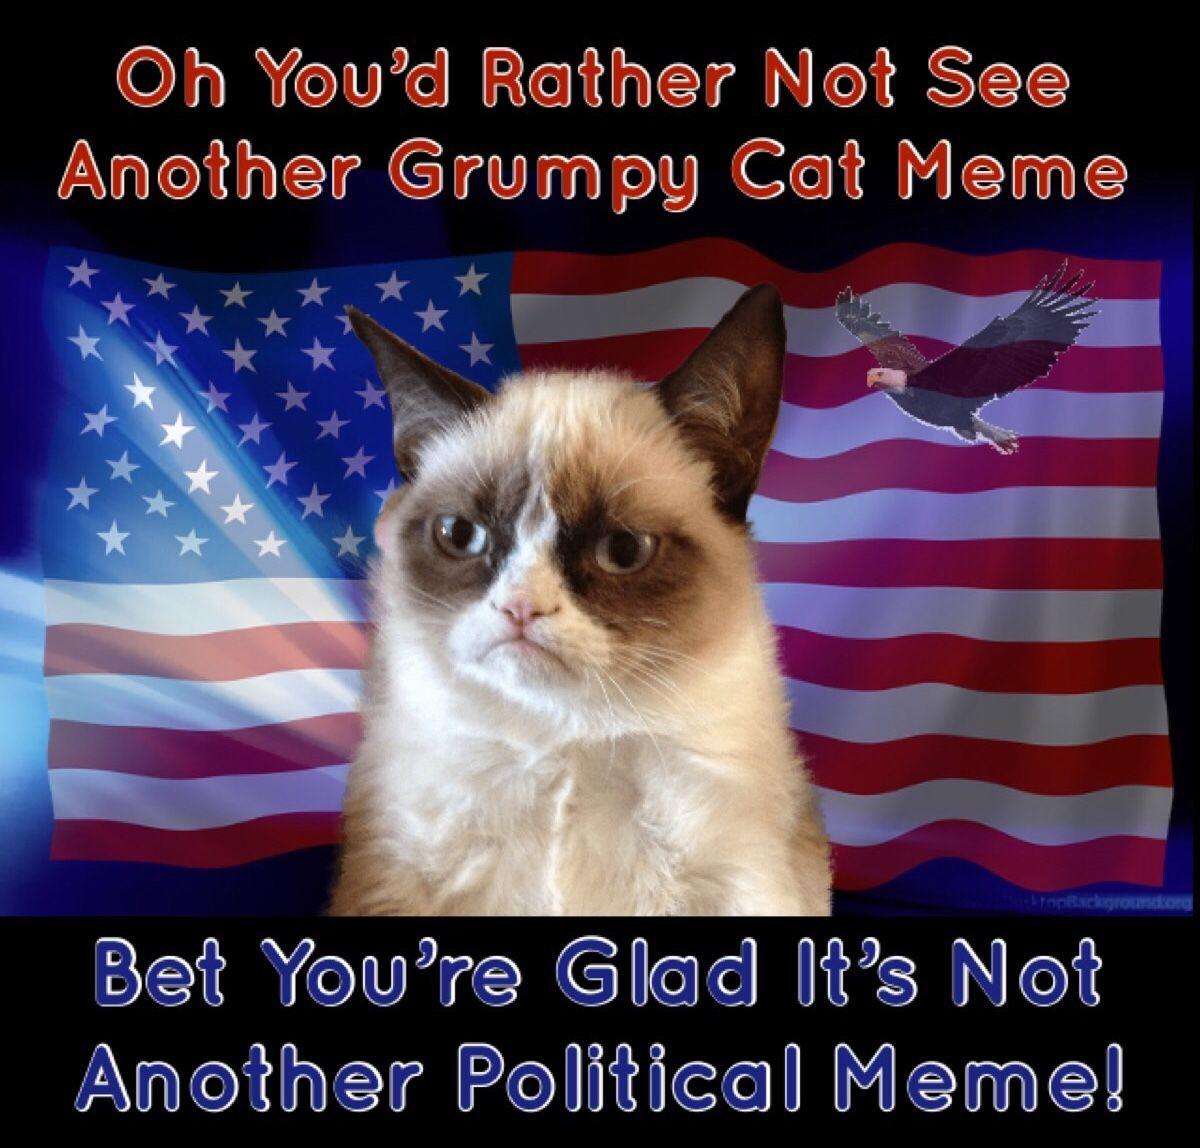 Bet You D Rather See Another Grumpy Cat Meme And Not Another Political Meme Grumpy Cat Grumpy Cat Humor Grumpy Cat Meme